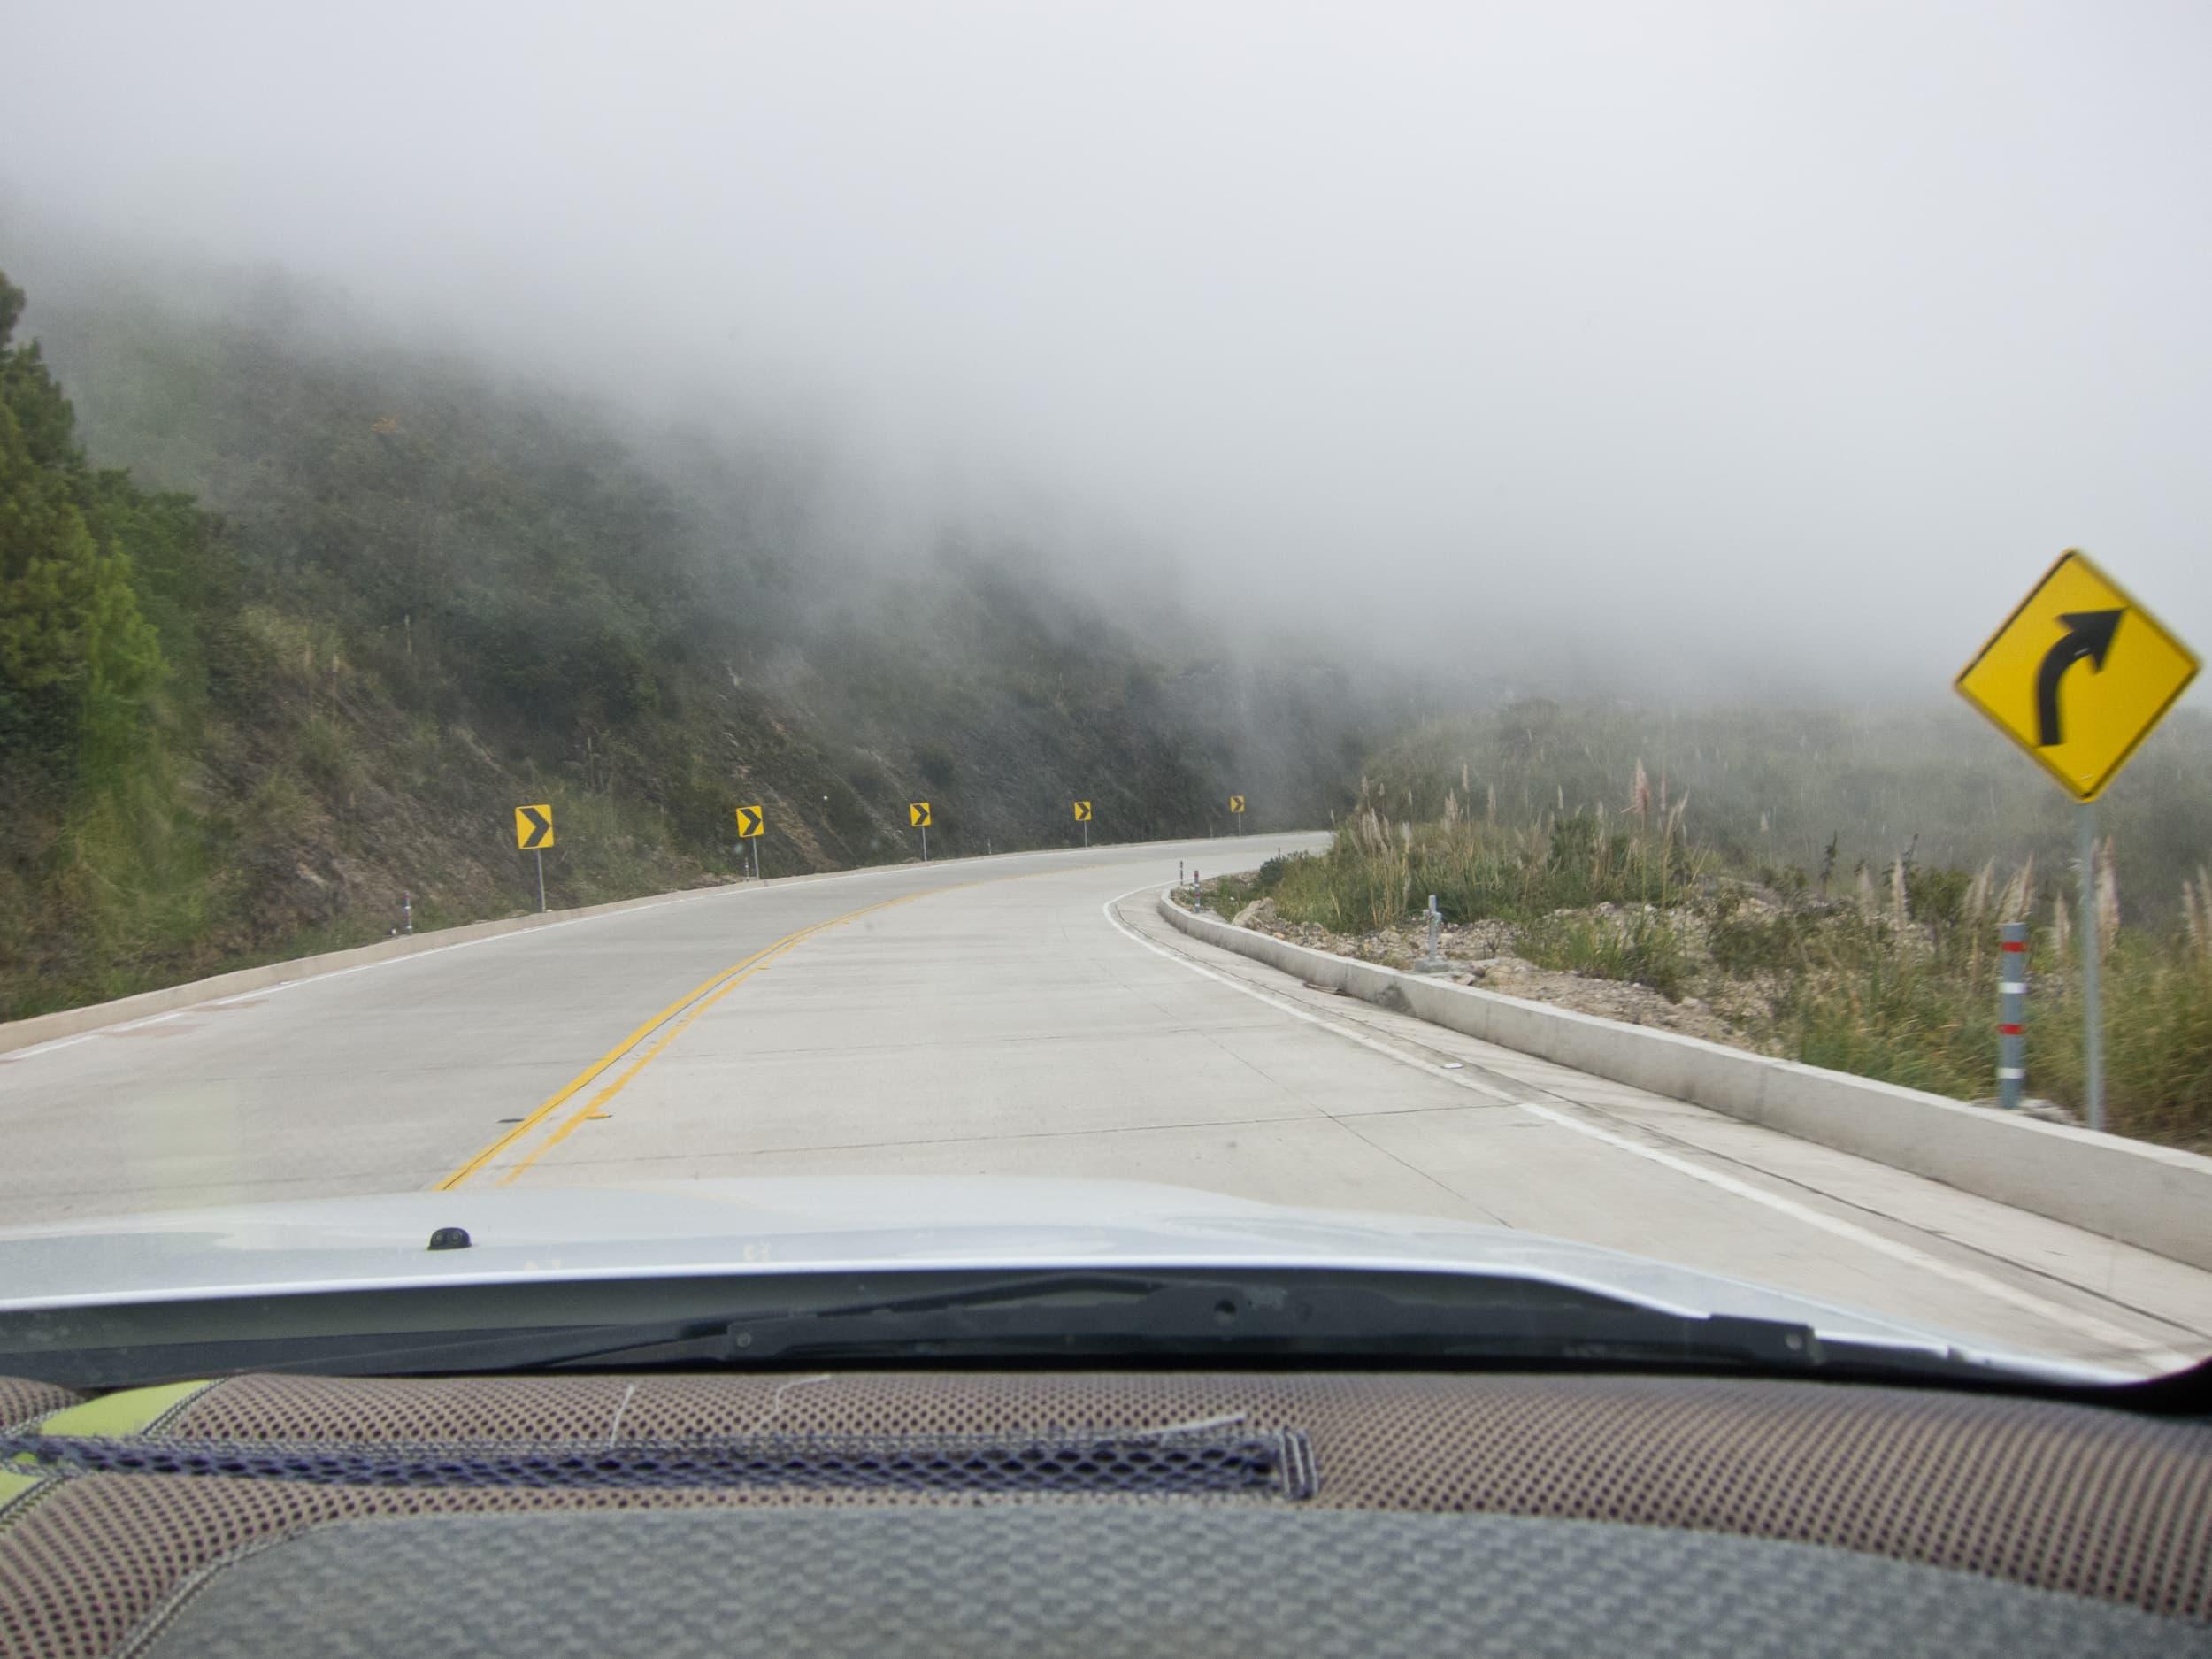 Navigating cloud-covered roads outside Cuenca, Ecuador